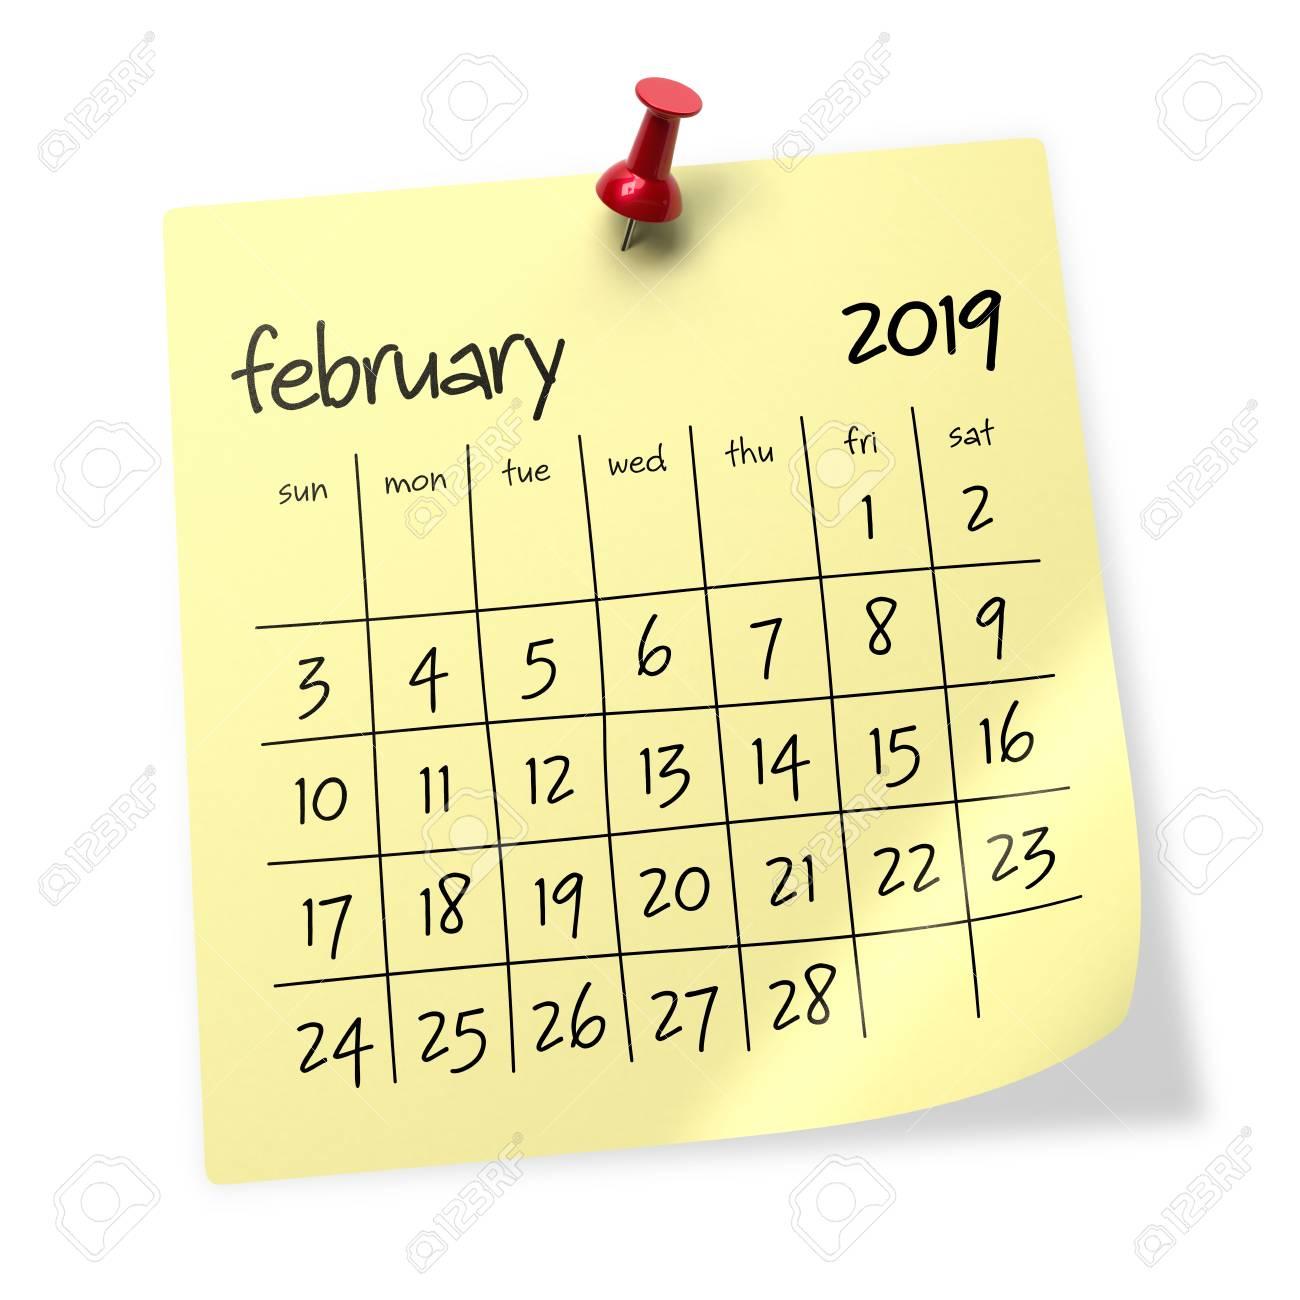 Calendar Background February 2019 February 2019 Calendar. Isolated On White Background. 3D